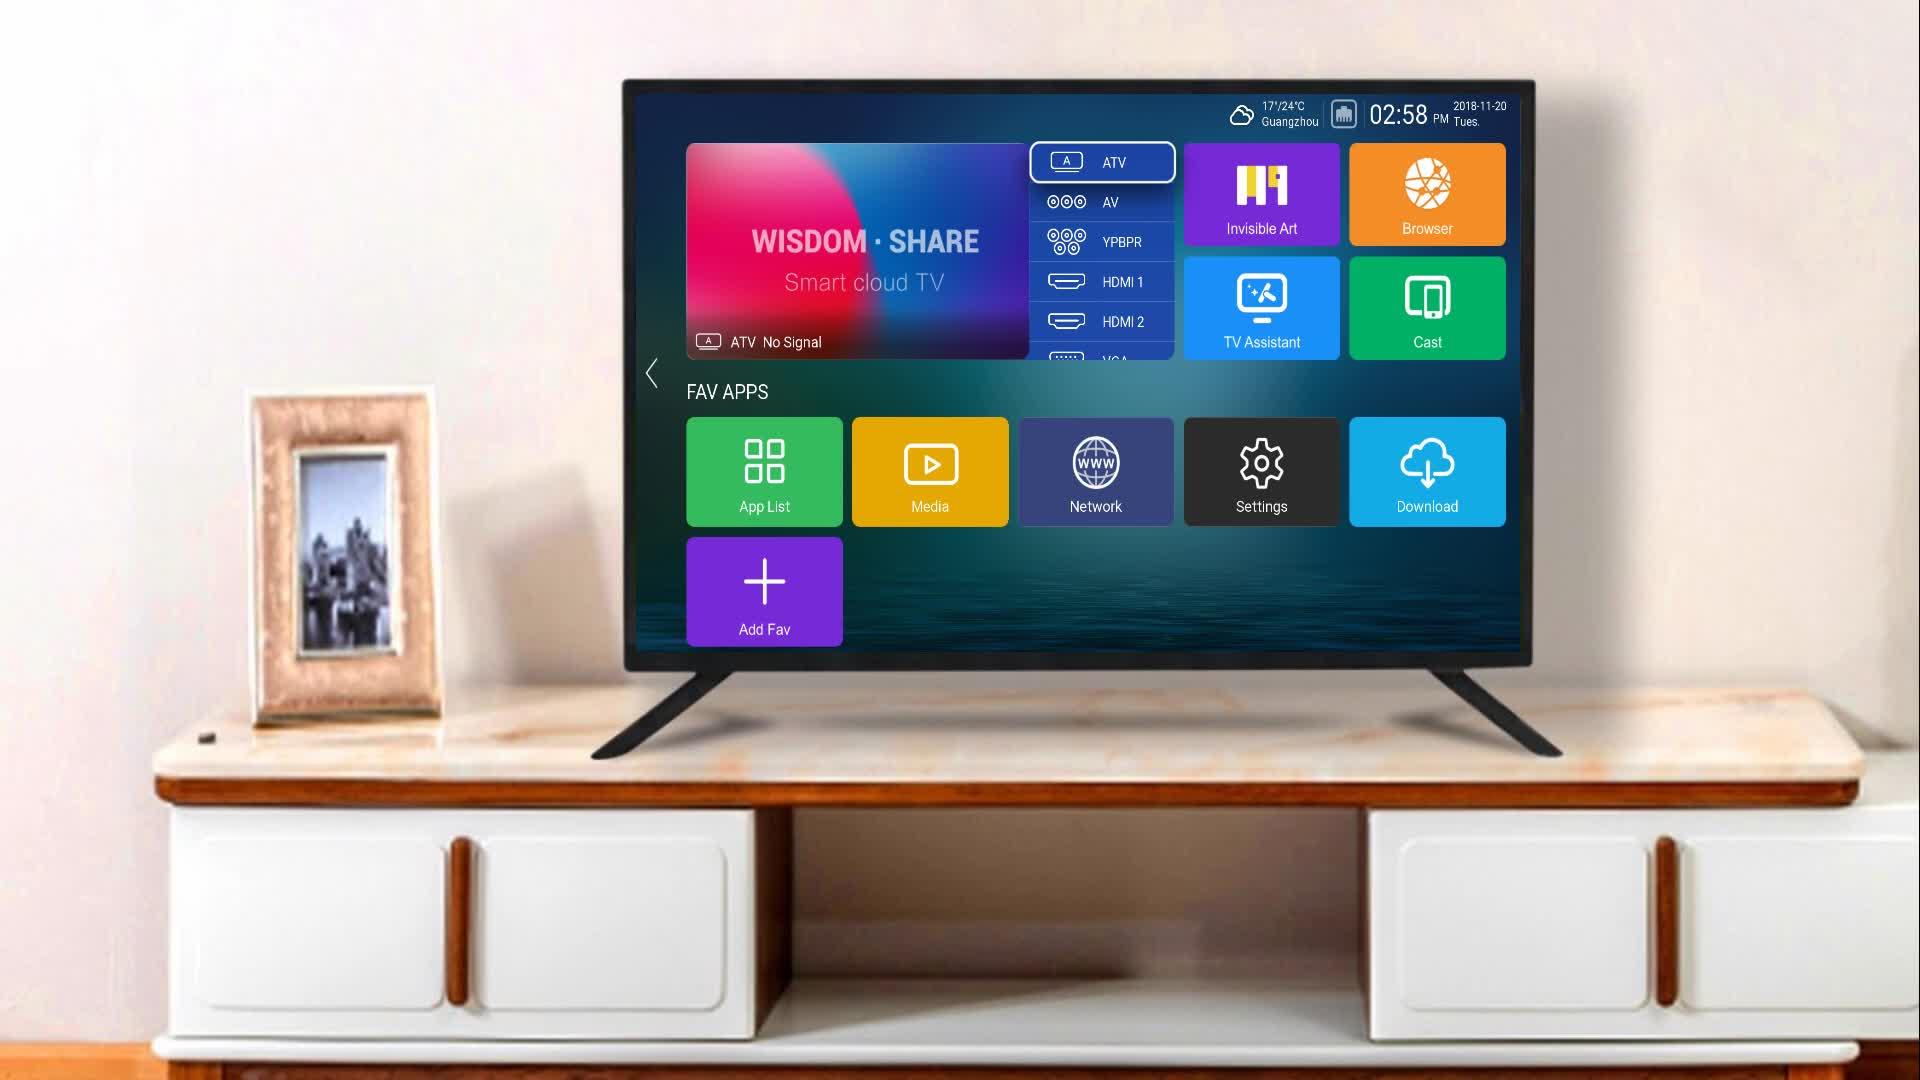 Haina 우수한 마더 보드 lcd led tv 예비 부품 텔레비전 wifi